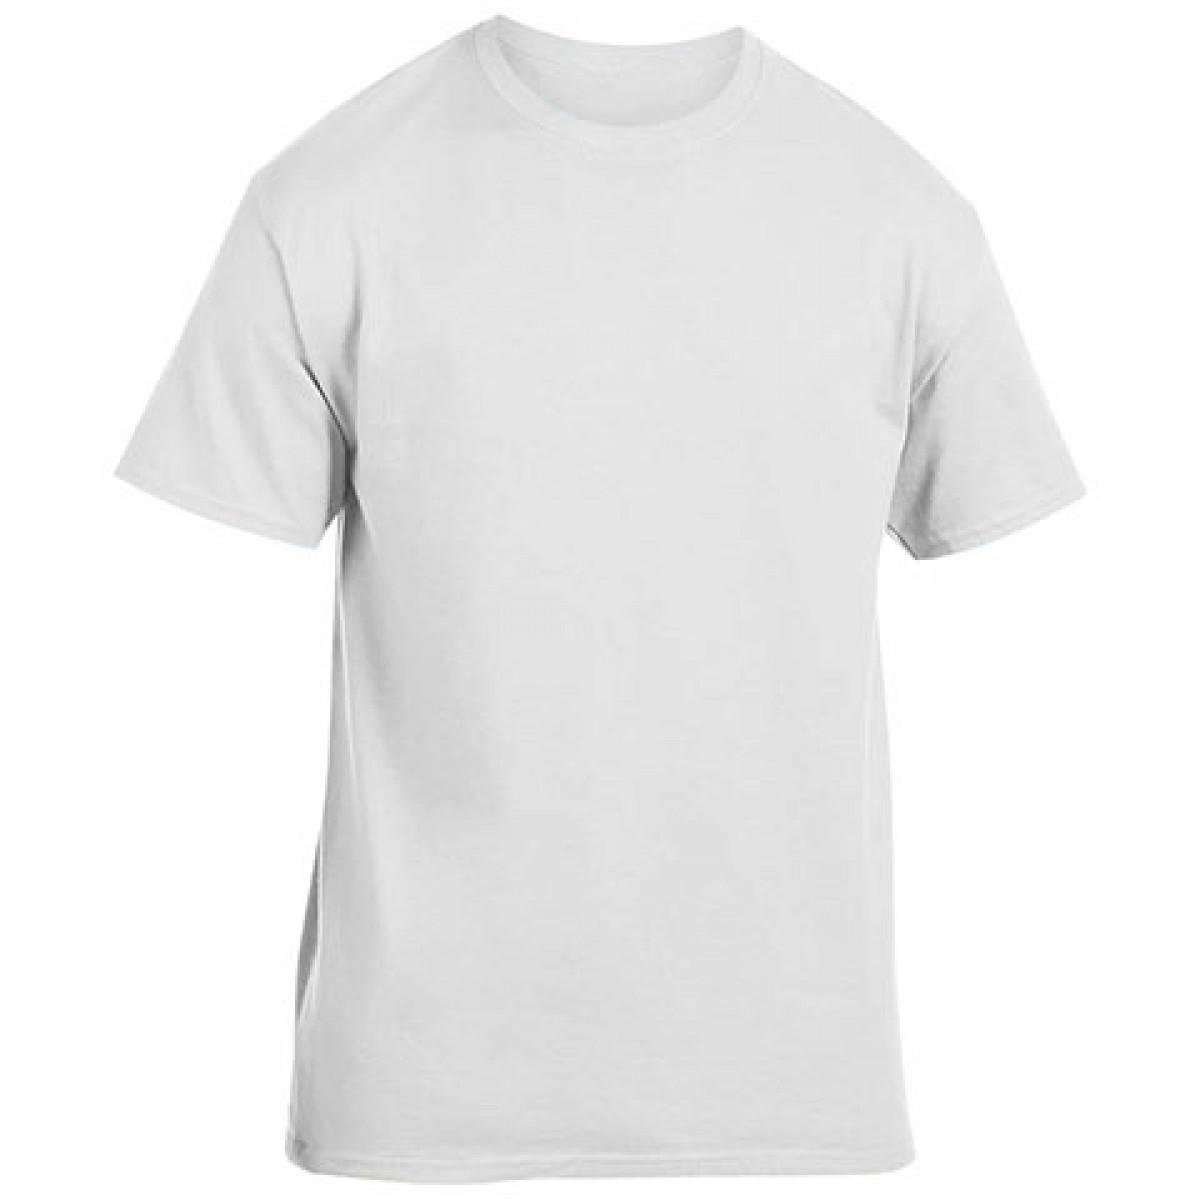 Heavy Cotton Activewear T-Shirt-White-3XL